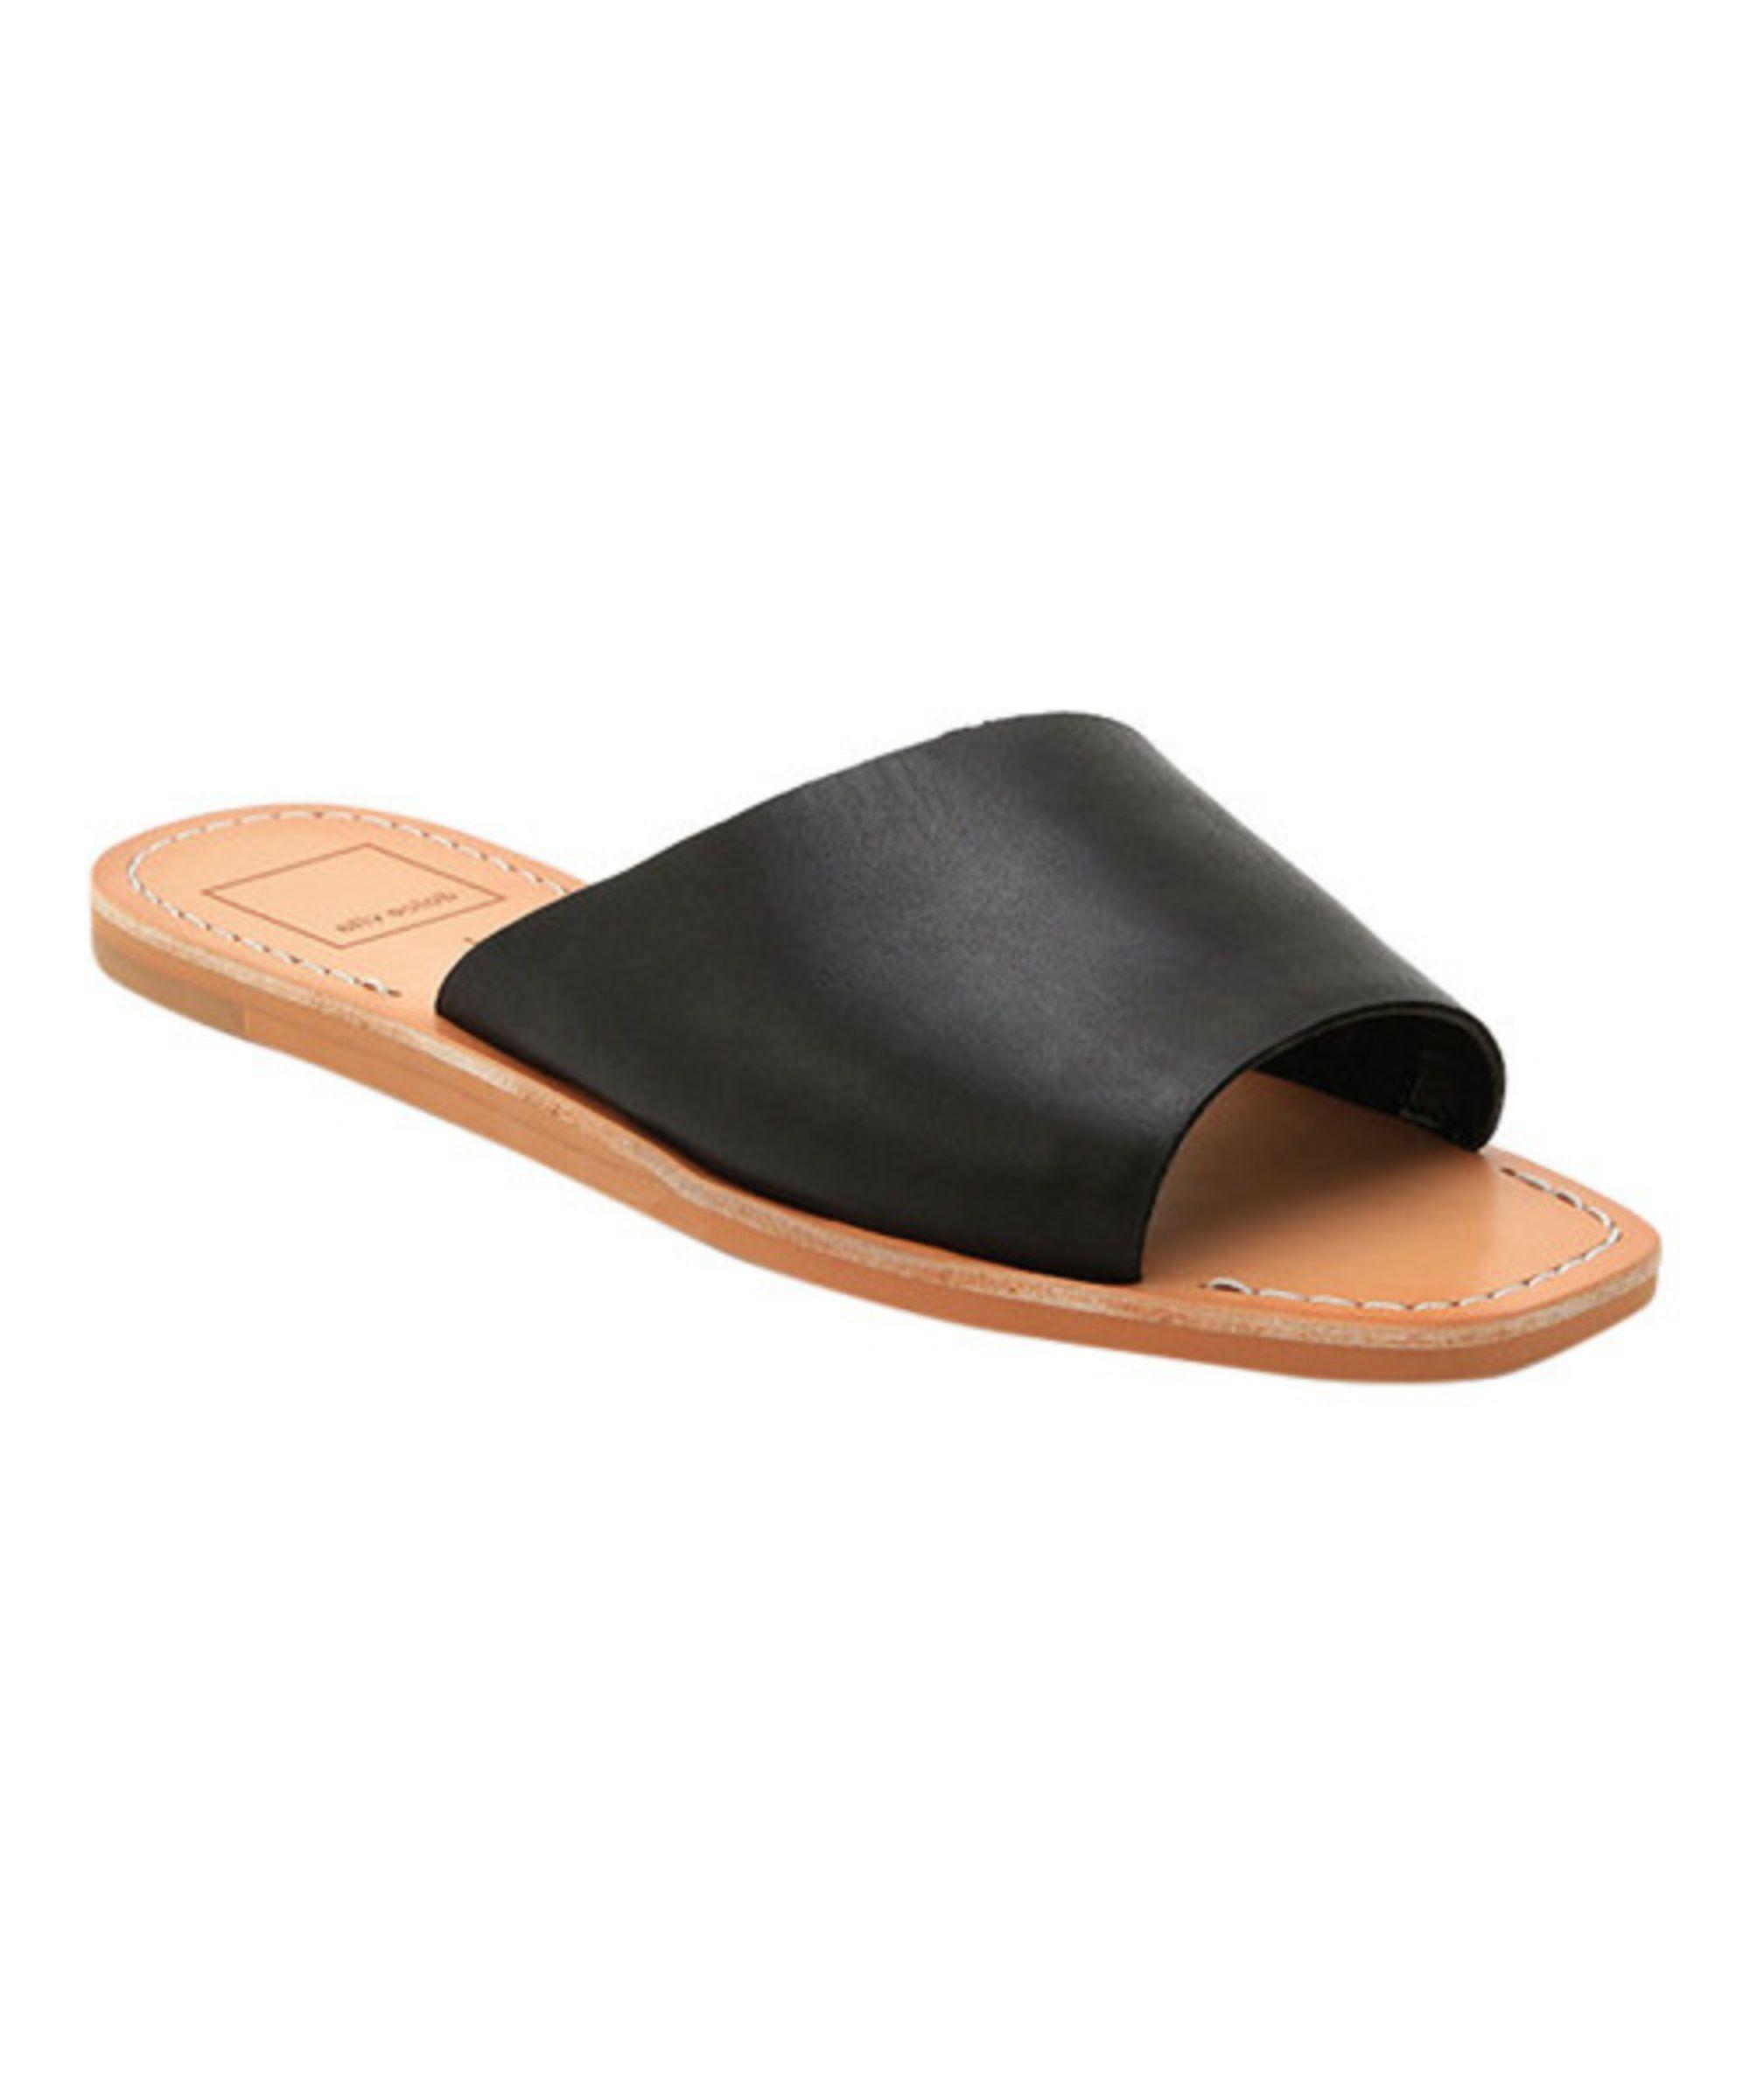 4cbc4f8c7 DOLCE VITA | Dolce Vita Women's Cato Slide Sandal #Shoes #Sandals #DOLCE  VITA